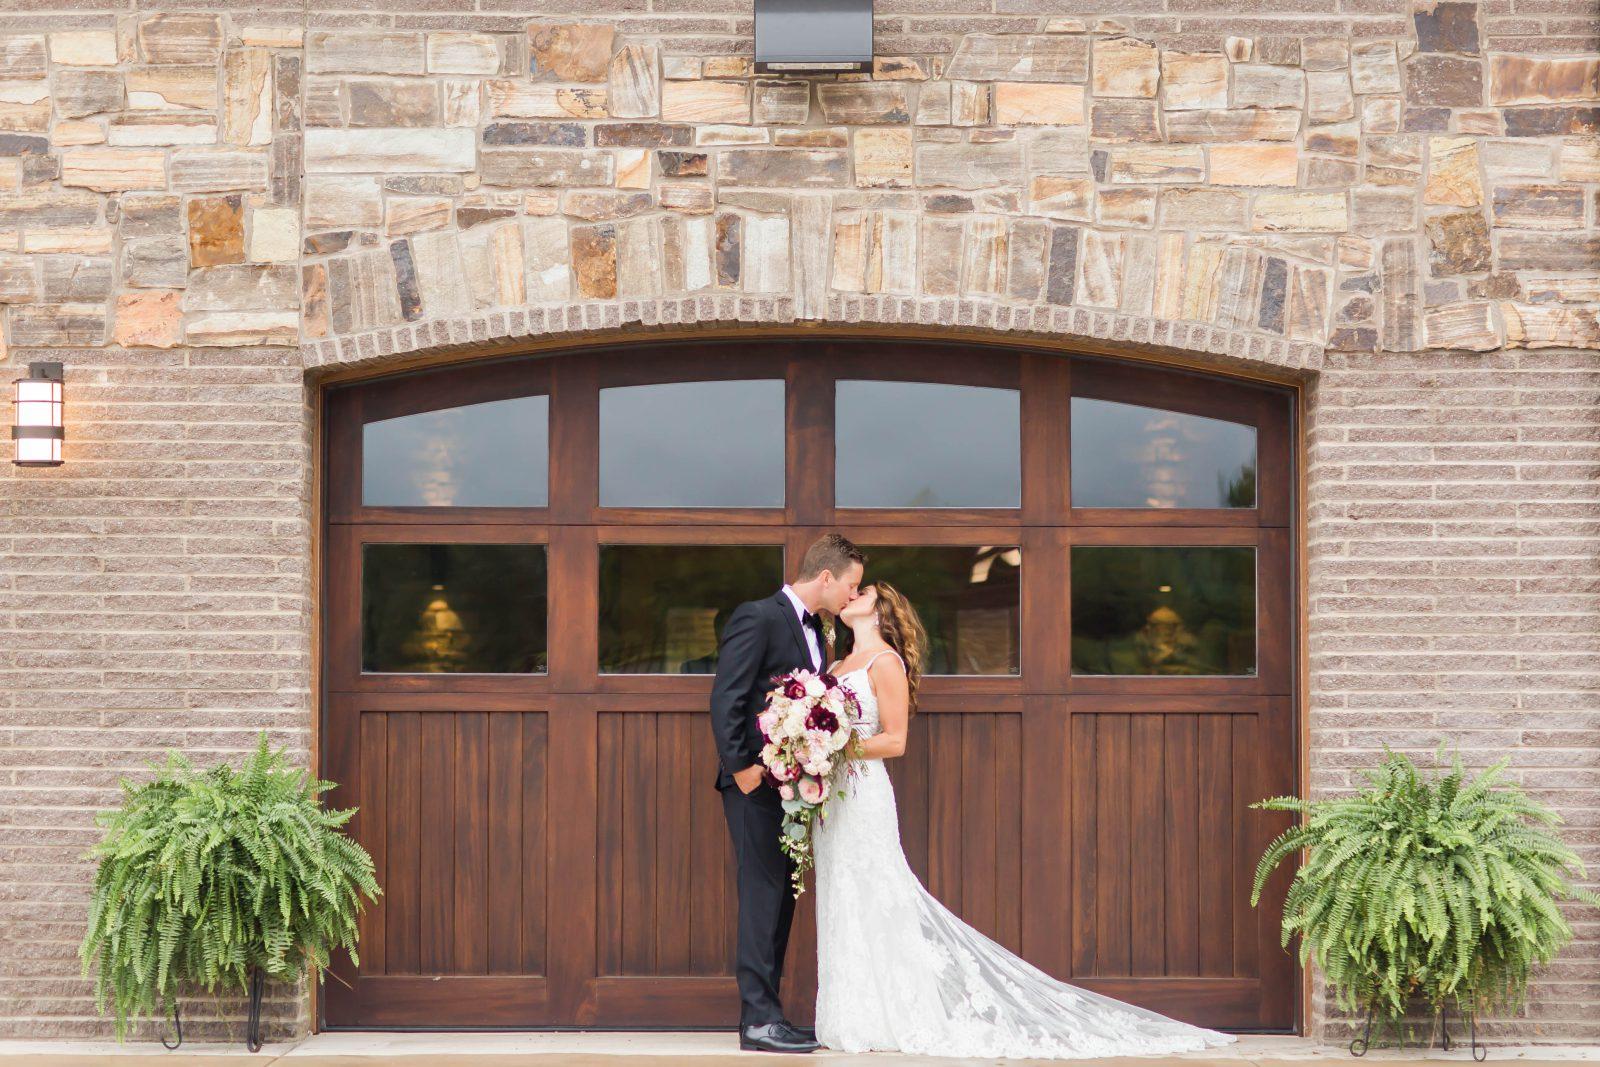 sunny-hill-wedding-venue-loren-jackson-photography-63